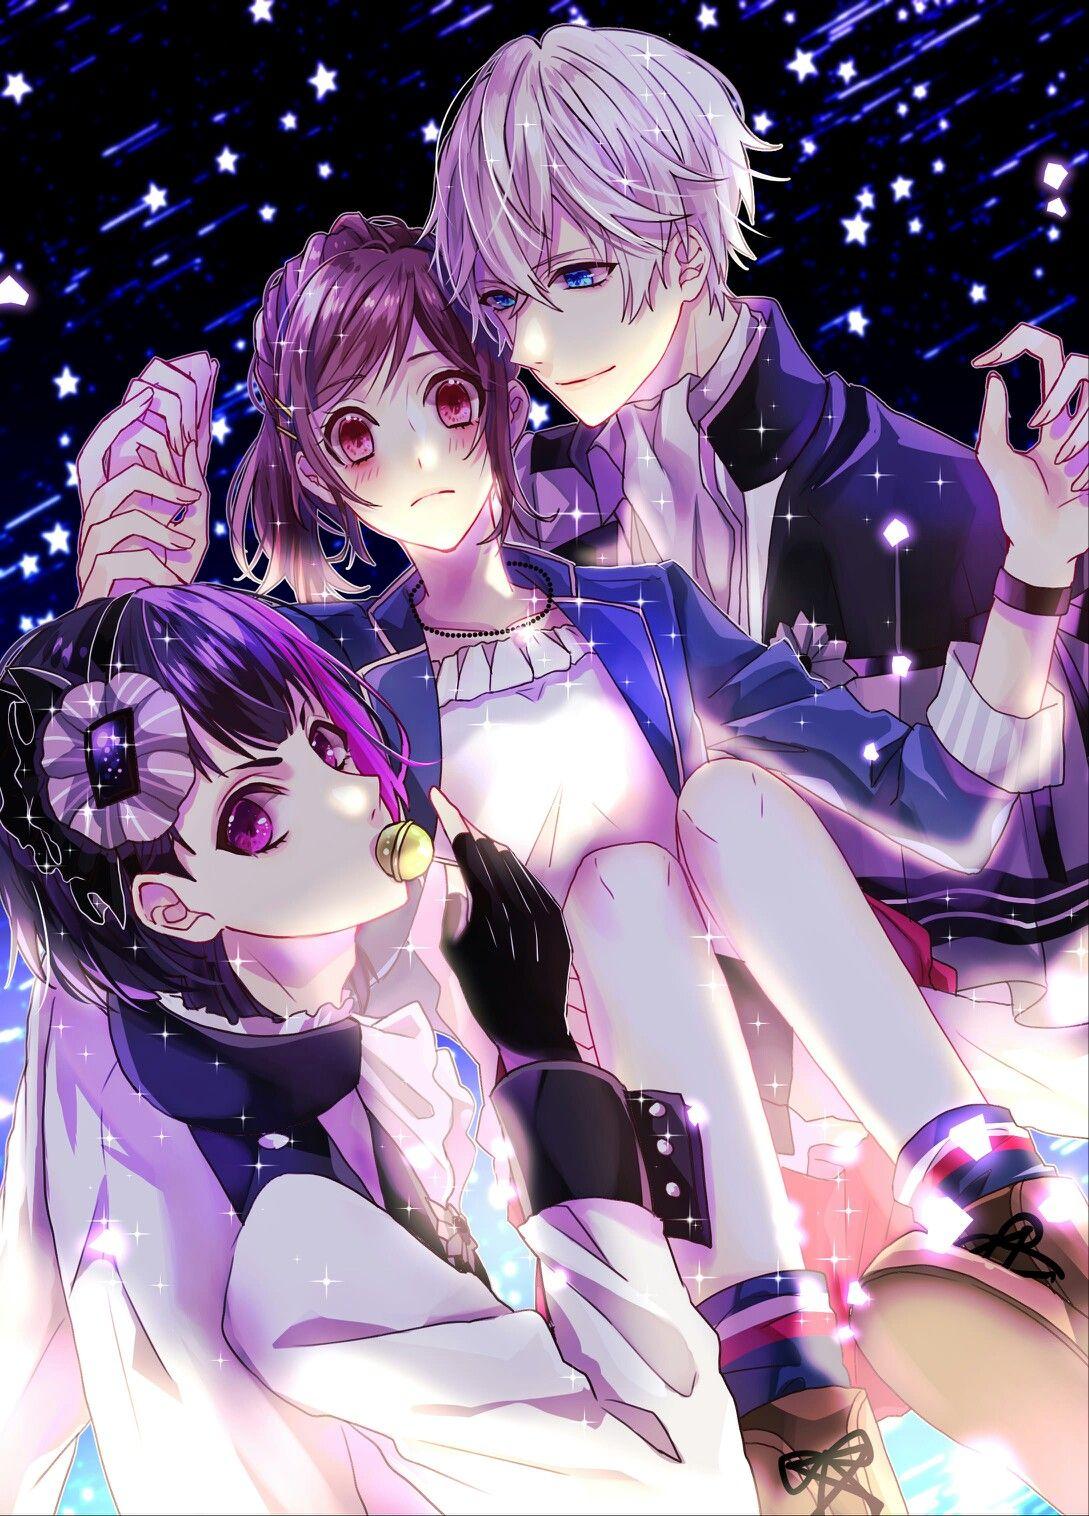 Kitakore Anime, Anime music, Anime images